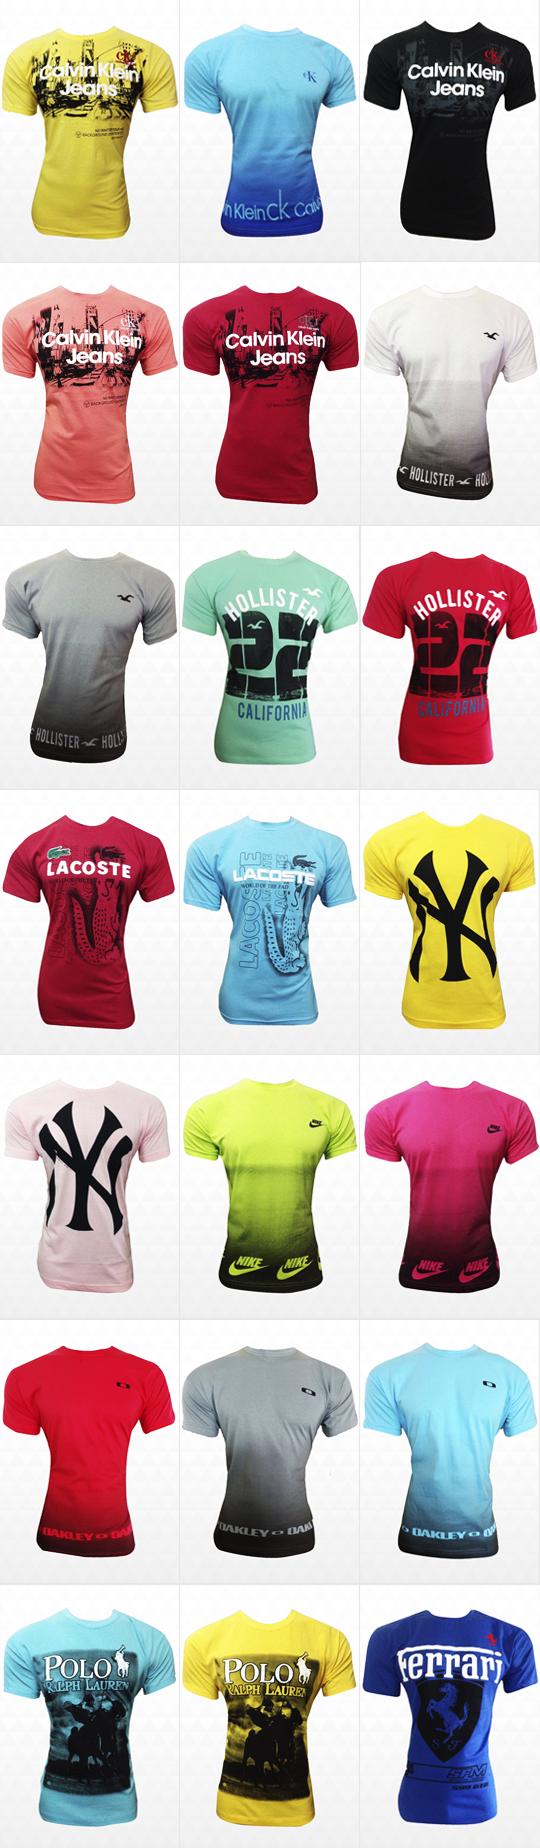 0d90c57dba537 Kit com 50 camisetas masculinas